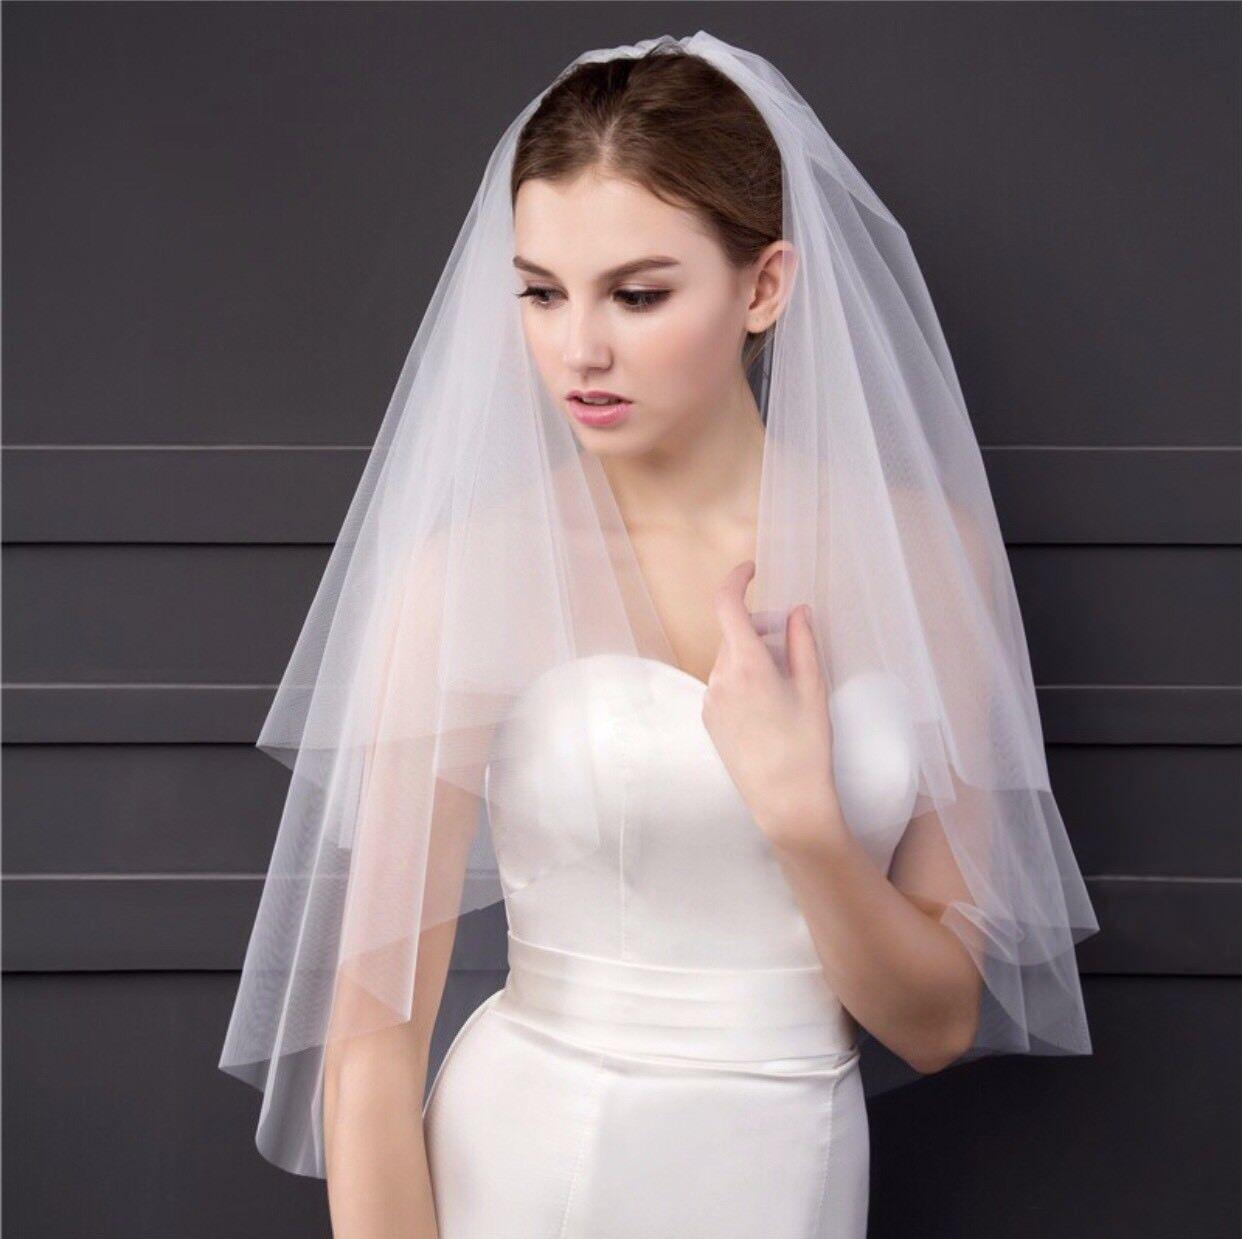 Bridal Wedding White Veil 2T With Metal Comb Plain Cut Edge Gorgeous Soft Tulle